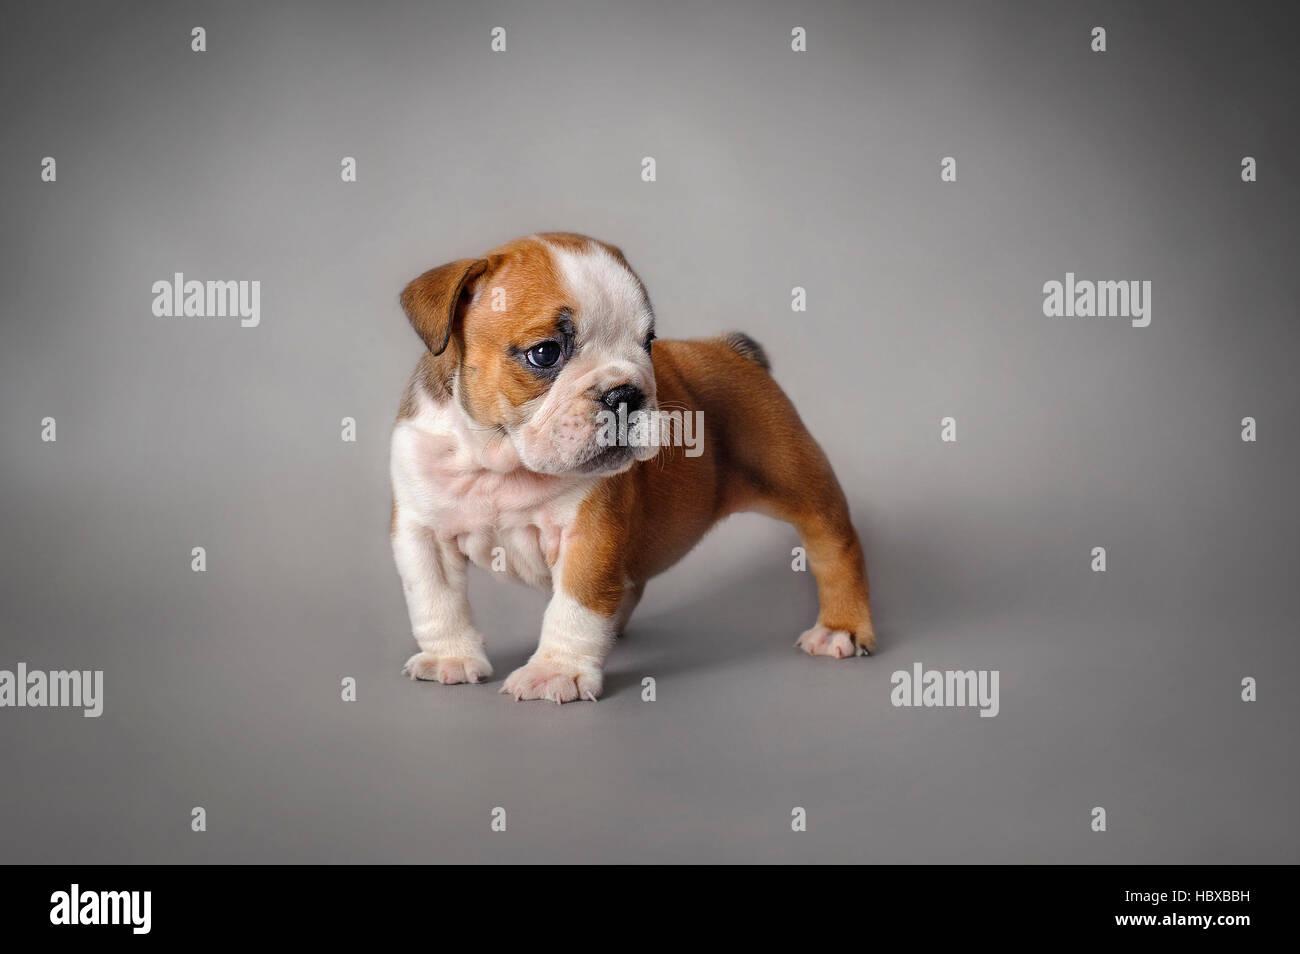 English Bulldog Puppy On Grey Background Stock Photo Alamy